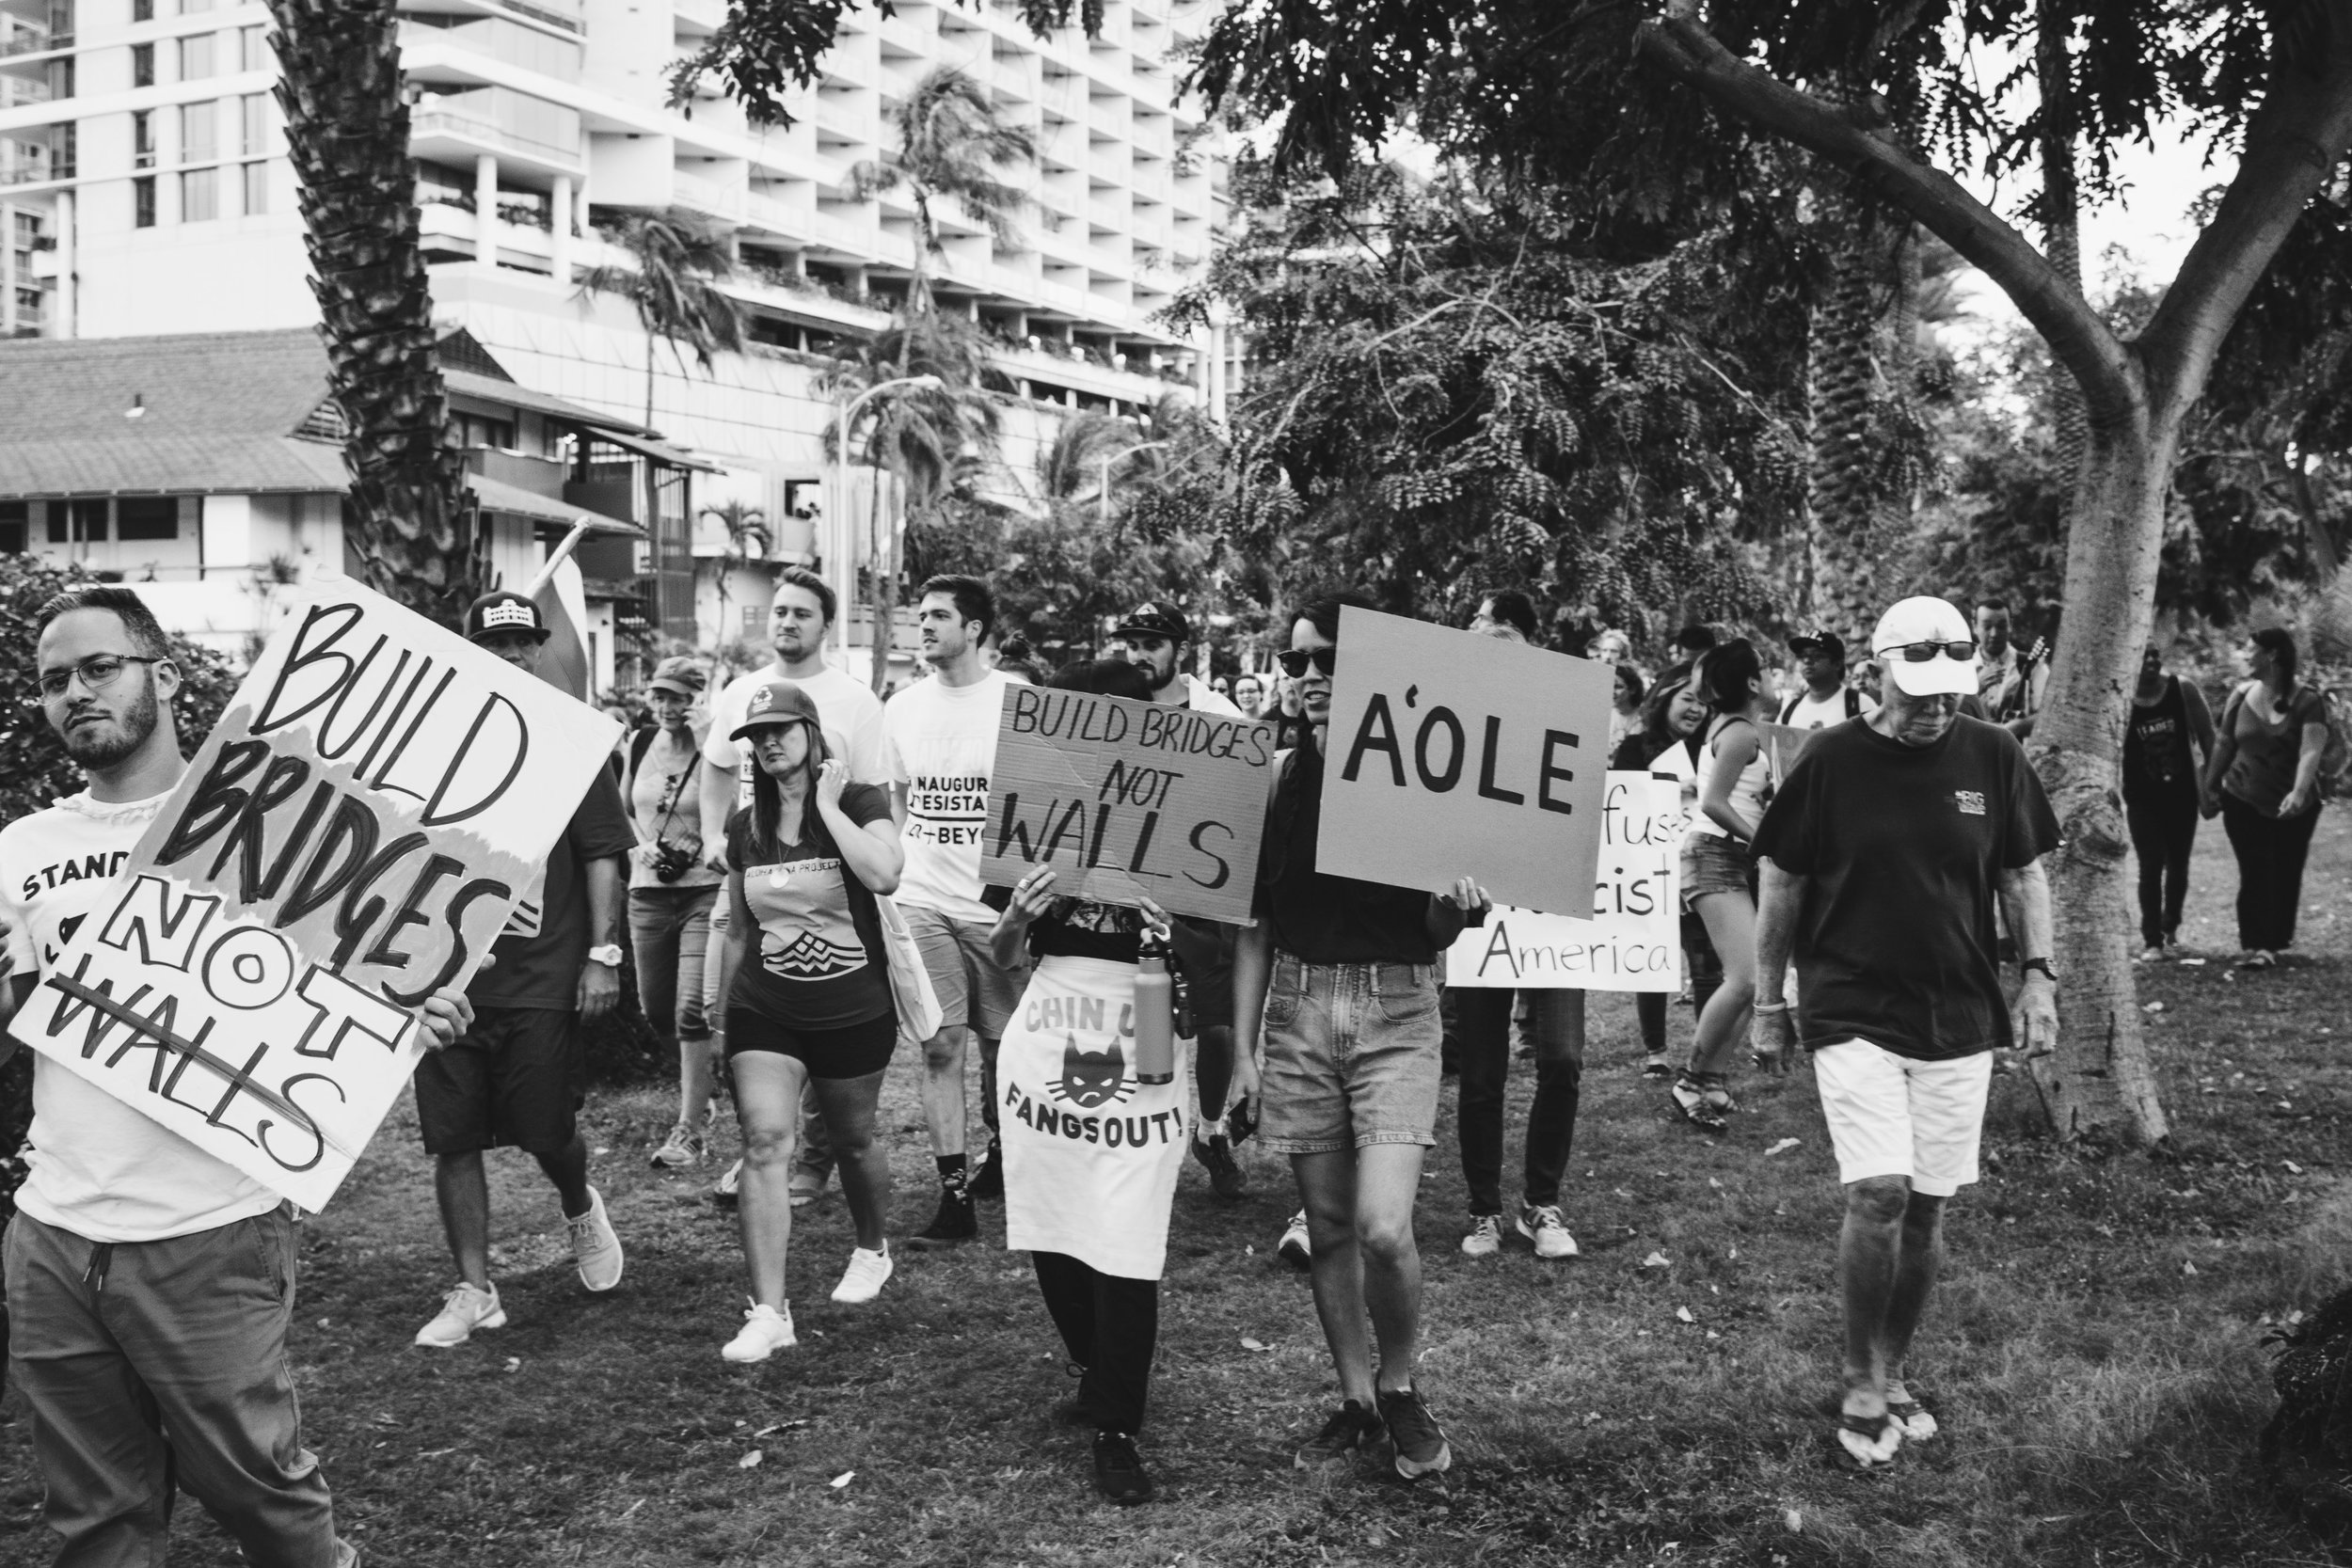 protest-8.jpg